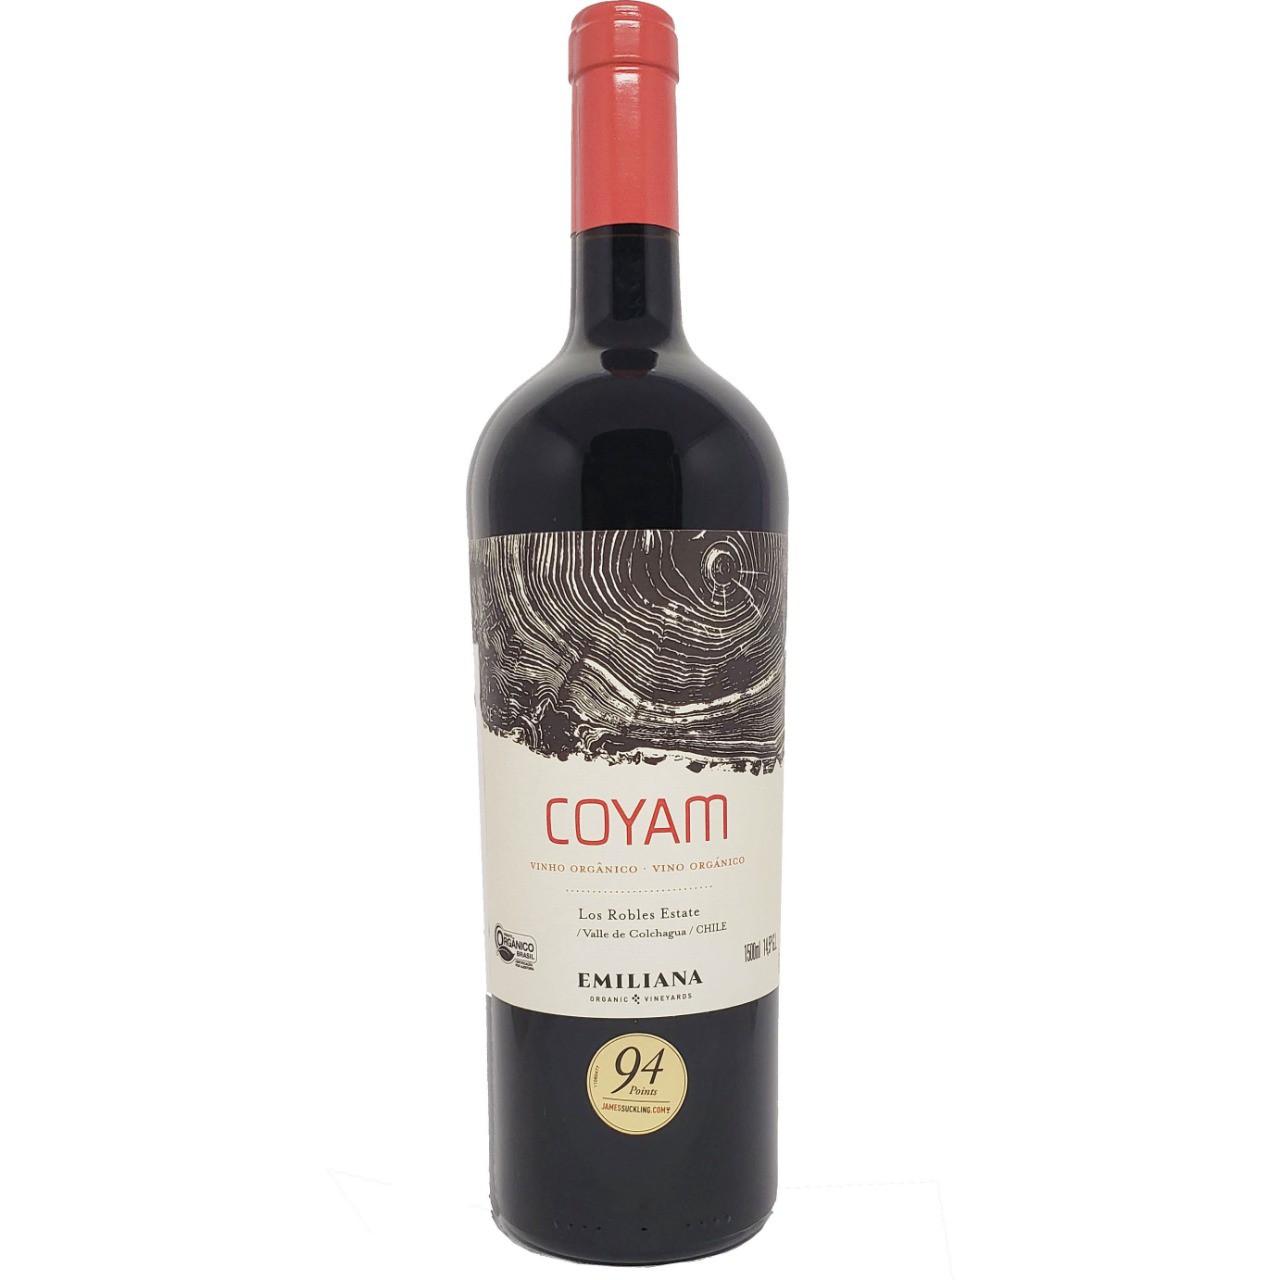 Vinho Tinto Emiliana Coyam 750ml